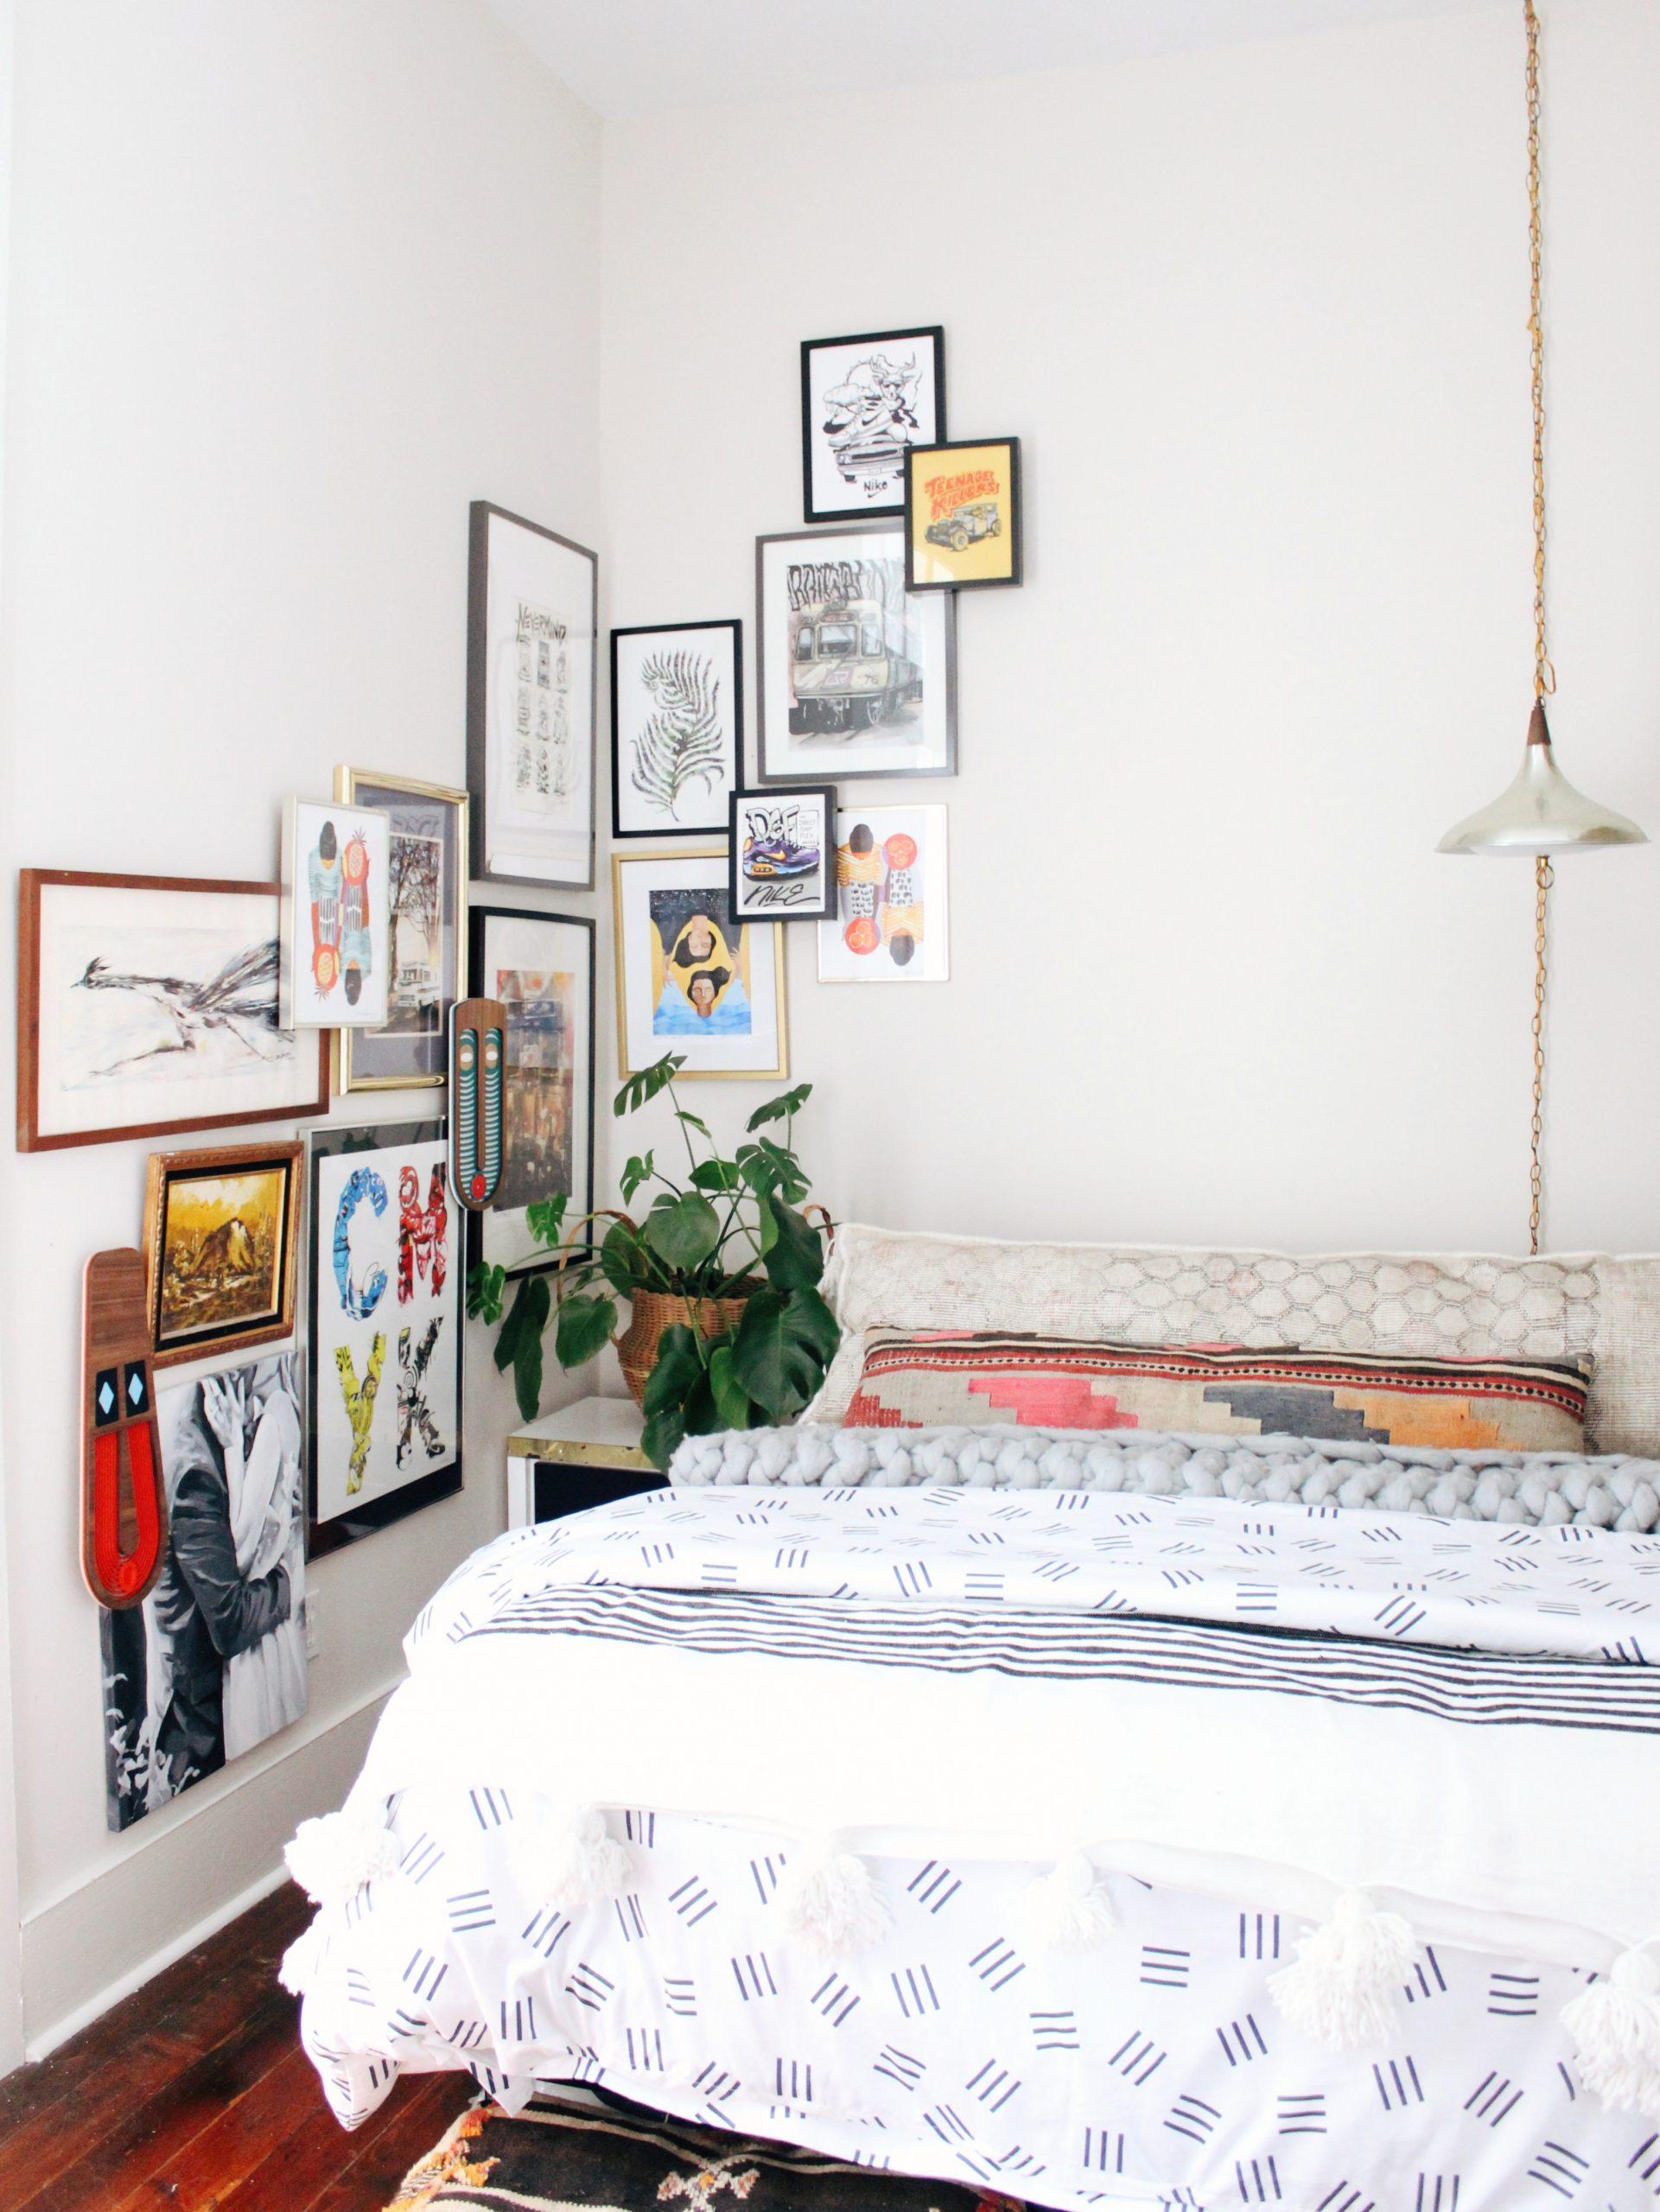 8 Stylish Master Bedroom Decorating Ideas  Apartment Therapy - Bedroom Ideas Apartment Therapy